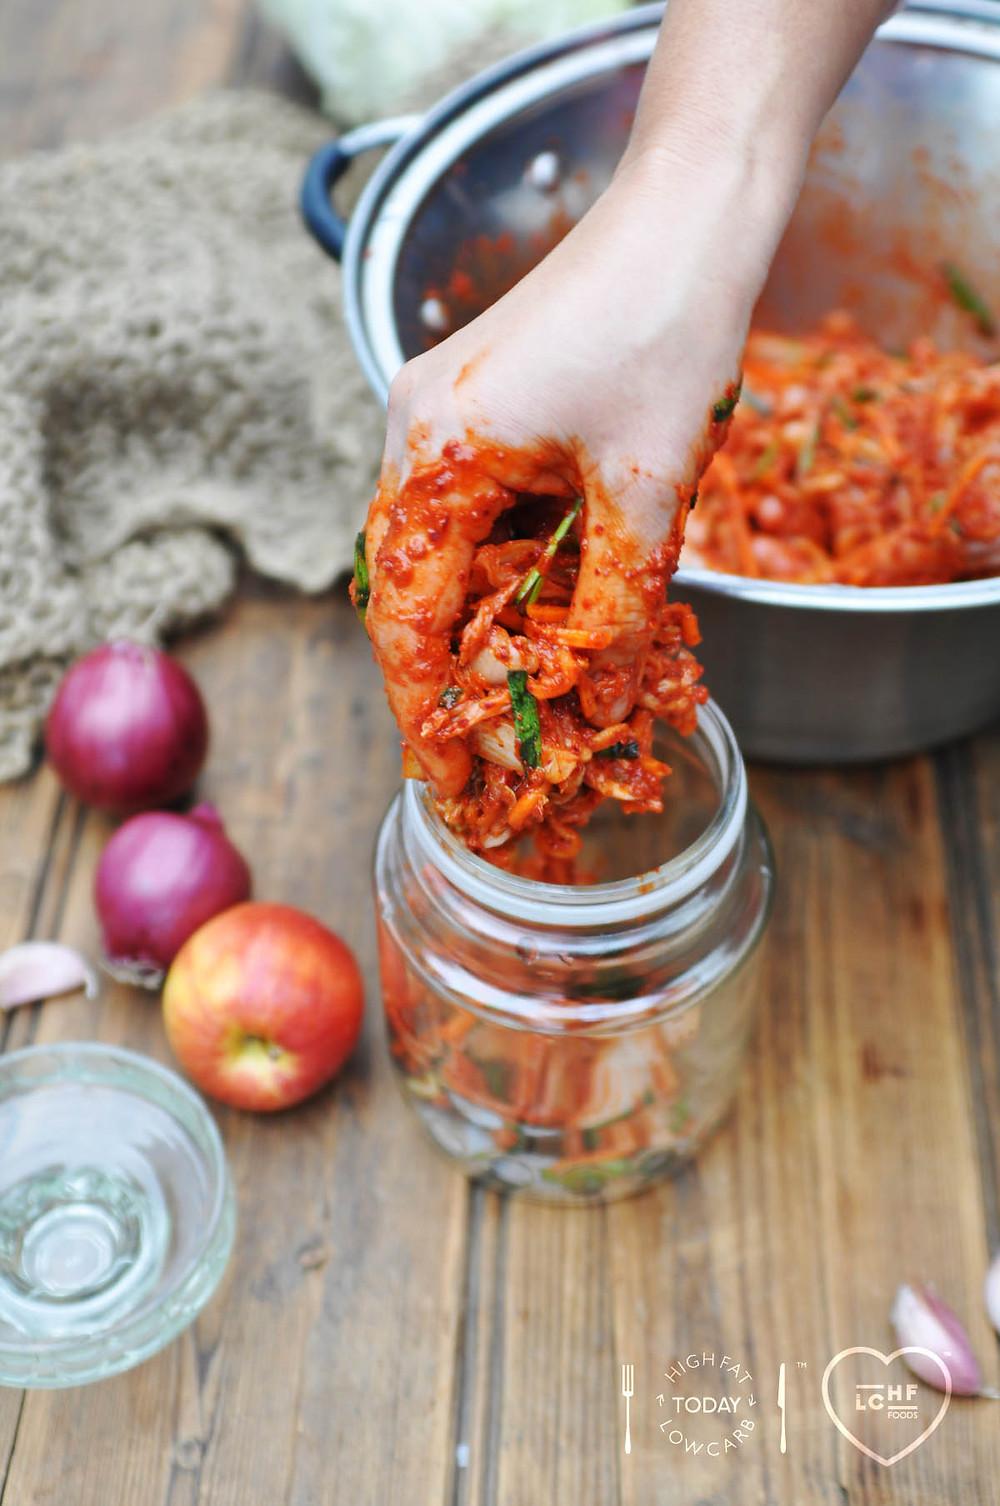 Pressing Kimchi mixture into glass jars